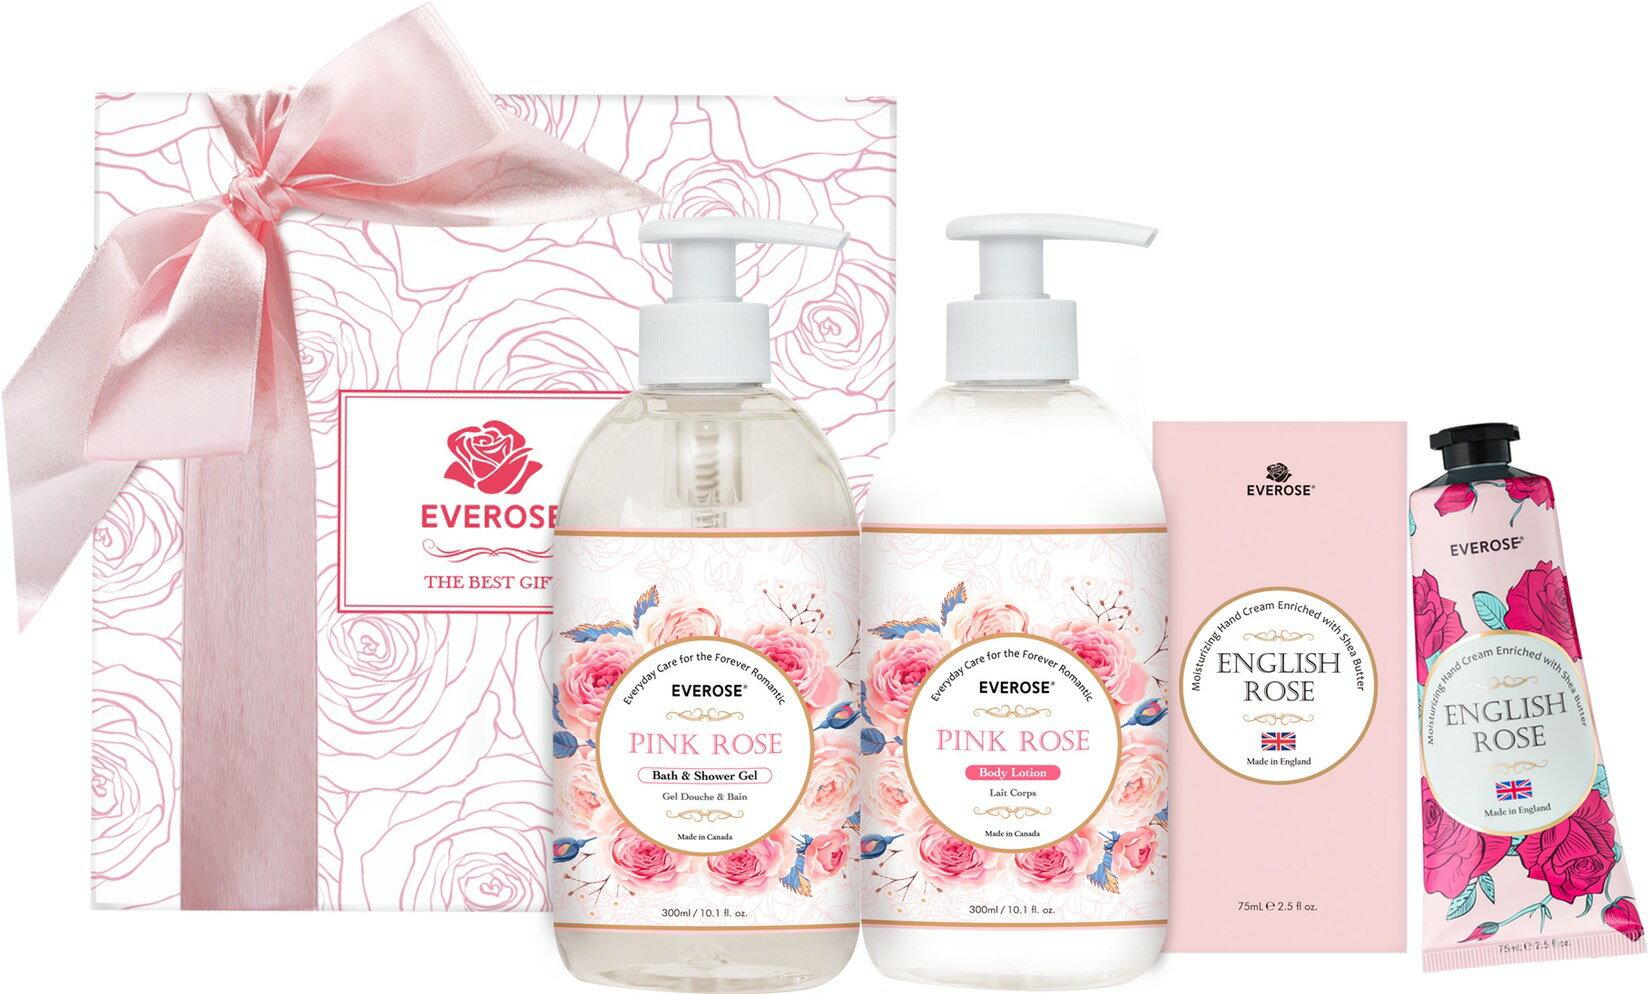 Everose愛芙蓉 薔薇玫瑰(沐浴精 300mL+保濕乳液 300mL+英國玫瑰香水護手霜 75mL)+粉紅萬用空盒